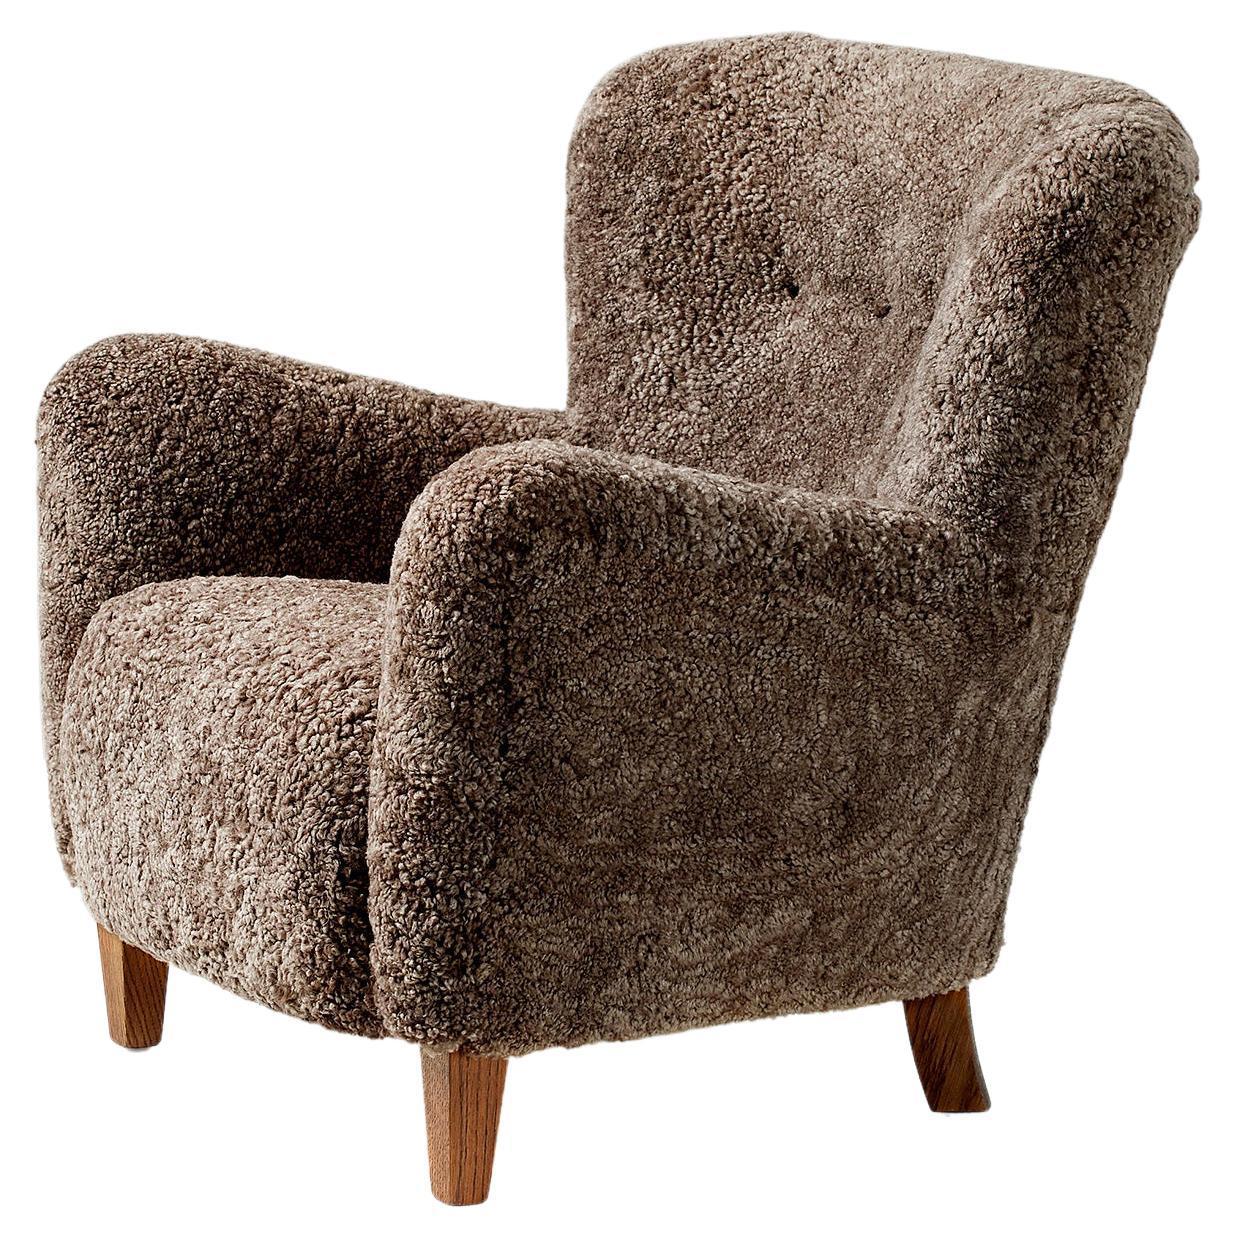 Custom Made 1940s Style Sheepskin Lounge Chair